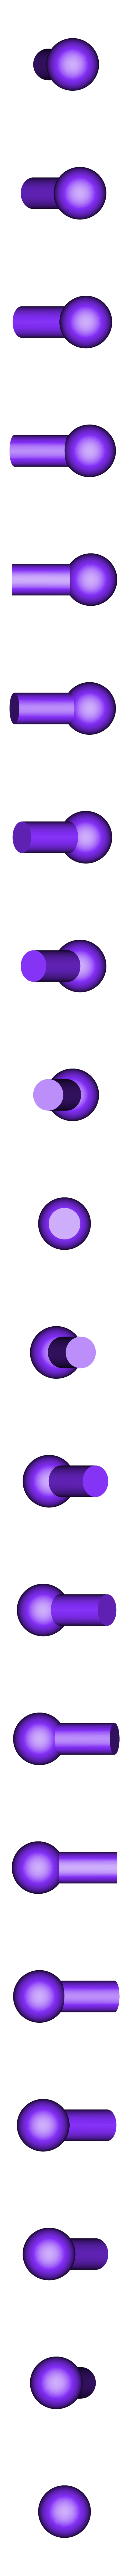 Ball Joint-Small_2X.STL Download STL file Grimlock • Model to 3D print, biglildesign